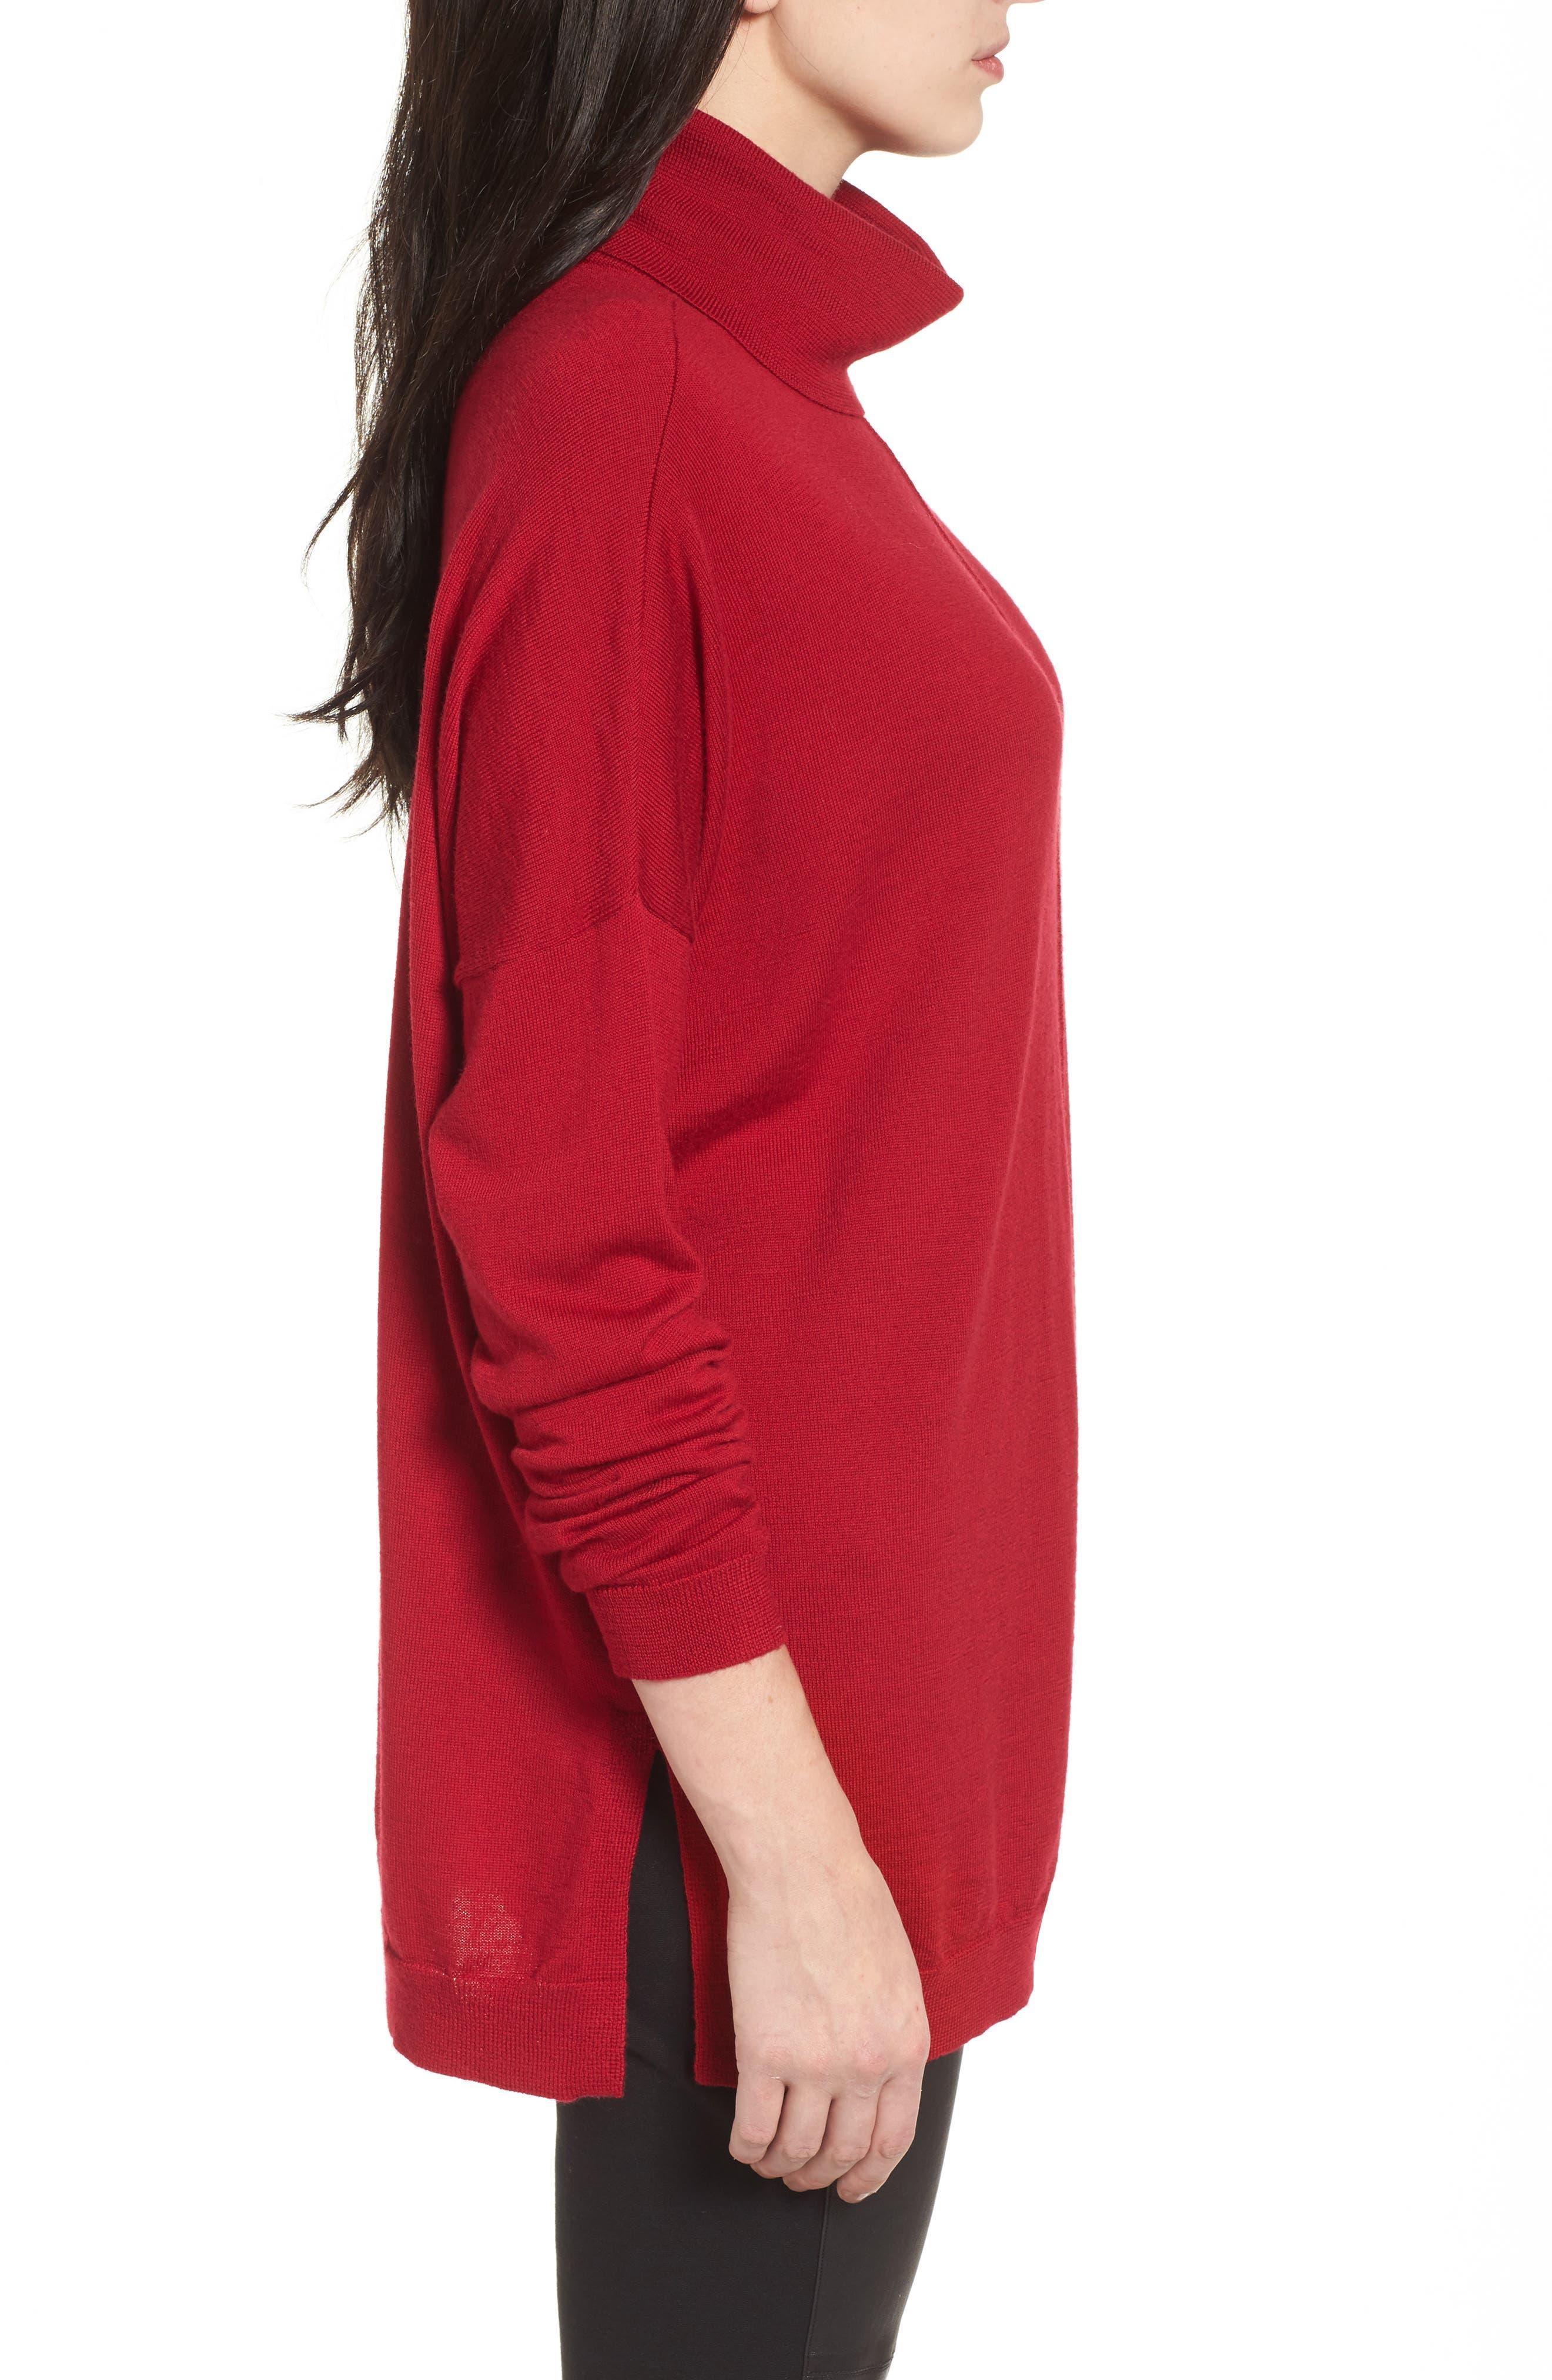 Alternate Image 3  - Eileen Fisher Merino Wool Boxy Turtleneck Sweater (Regular & Petite)